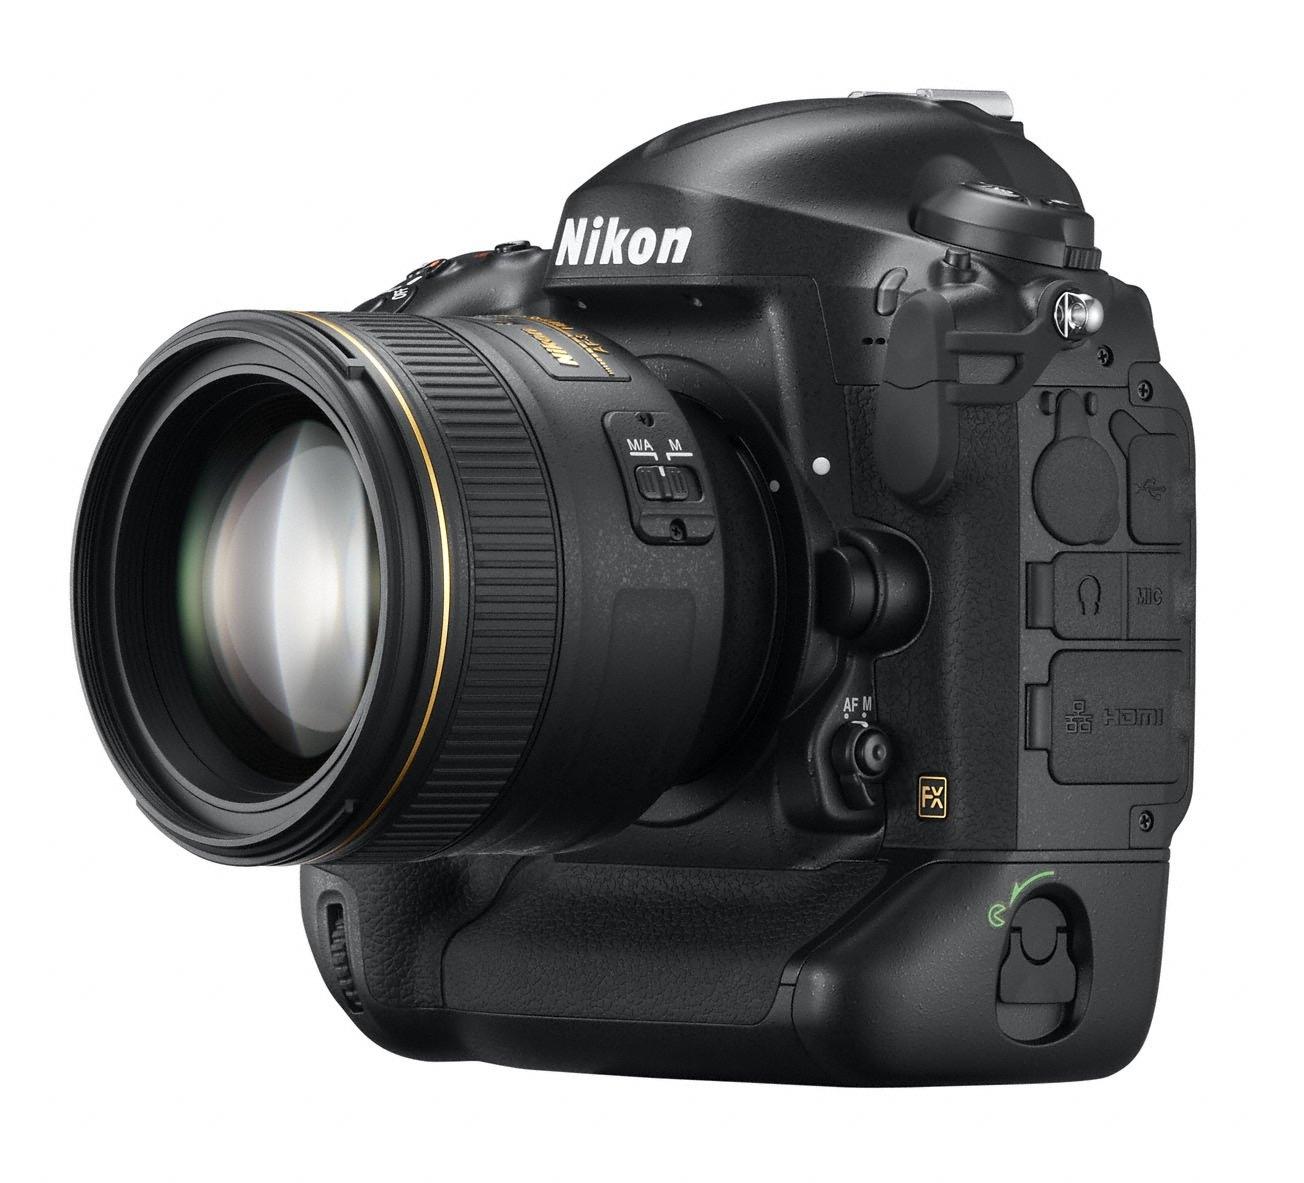 Camera Nikon Dslr Camera Range nikon announces the next generation d4 digital slr camera 16 2 mp camera